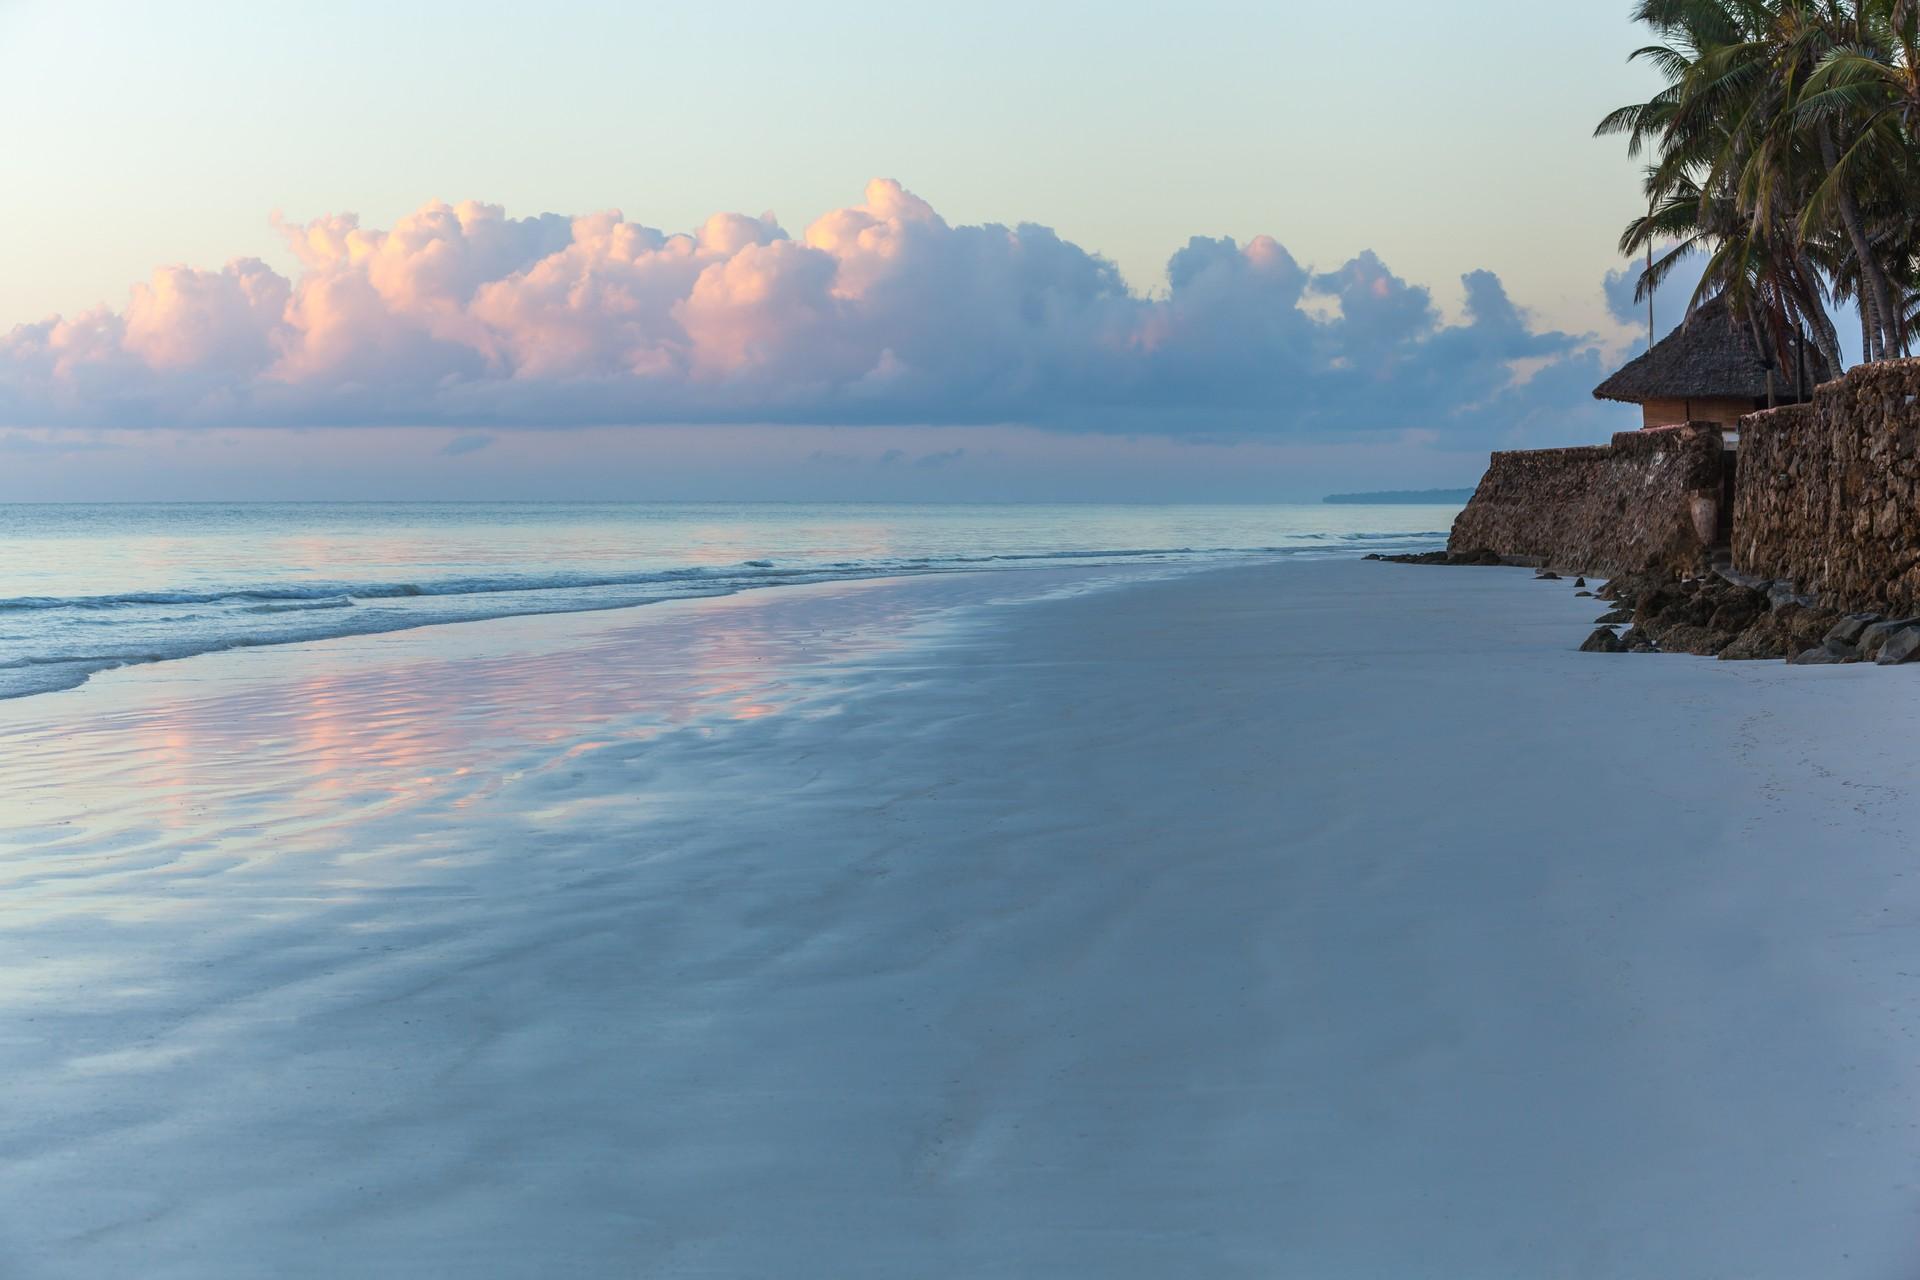 Sunrise over a beach in Kenya